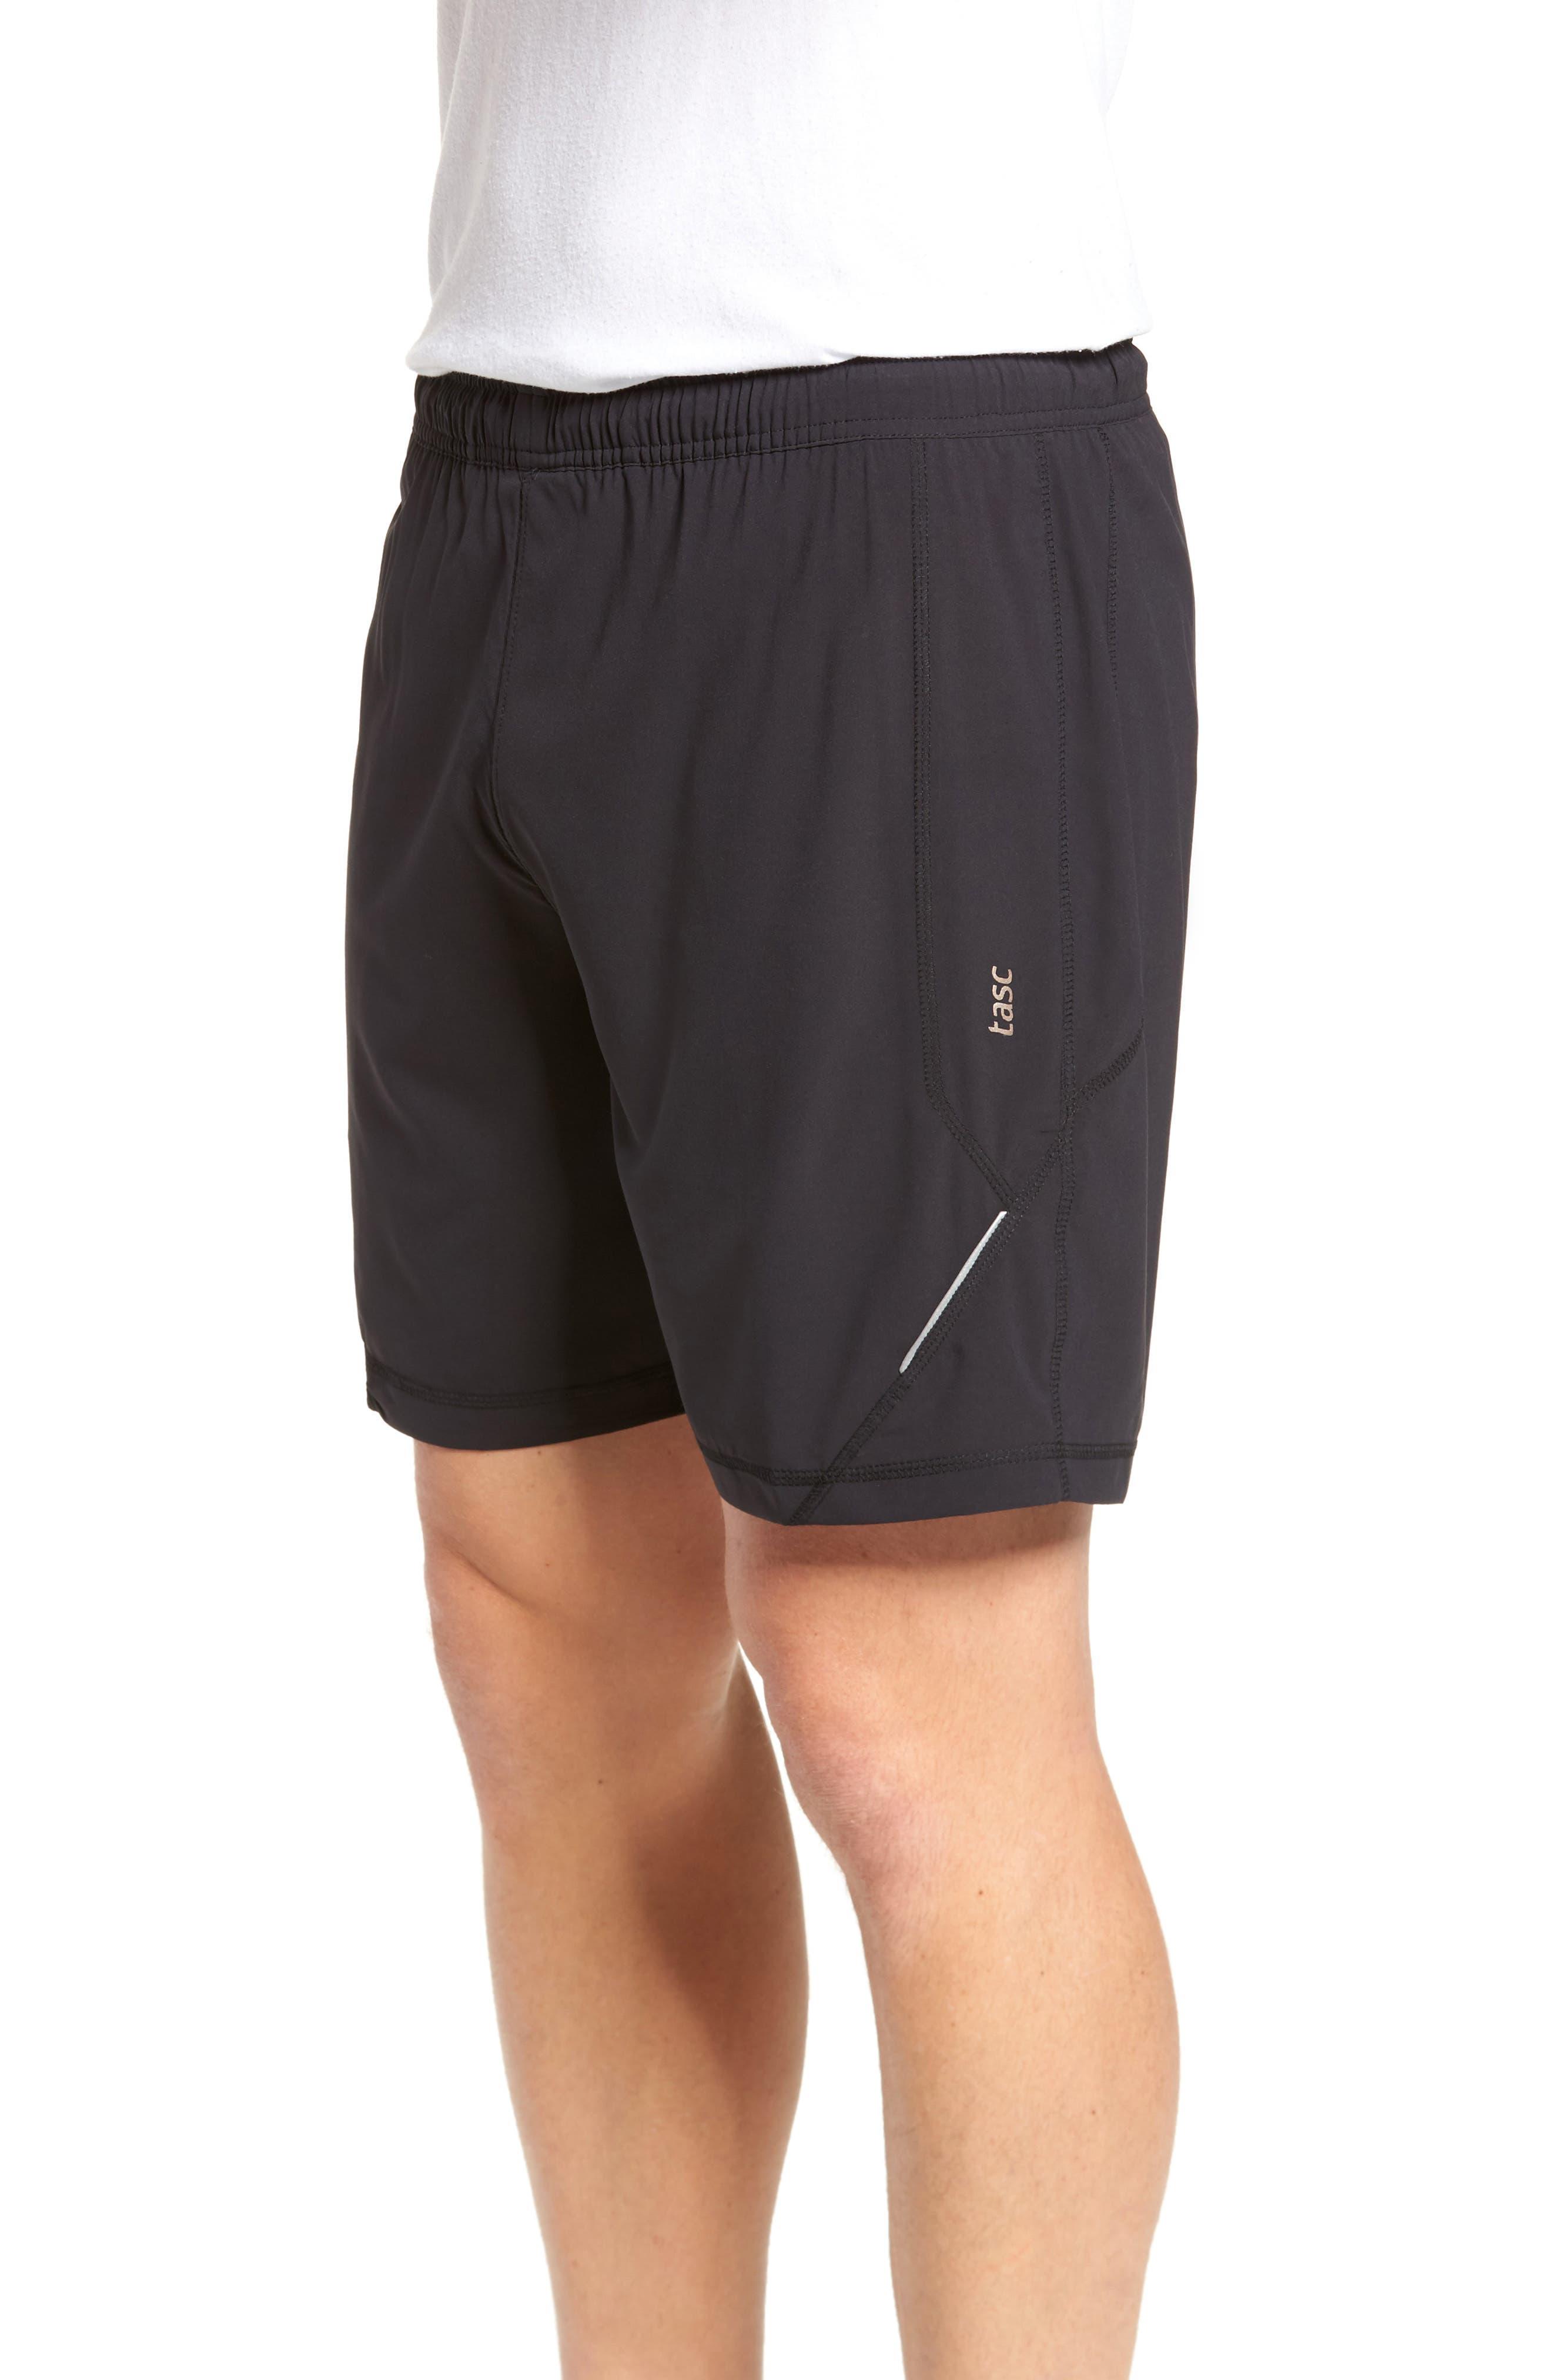 Propulsion Athletic Shorts,                             Alternate thumbnail 3, color,                             BLACK